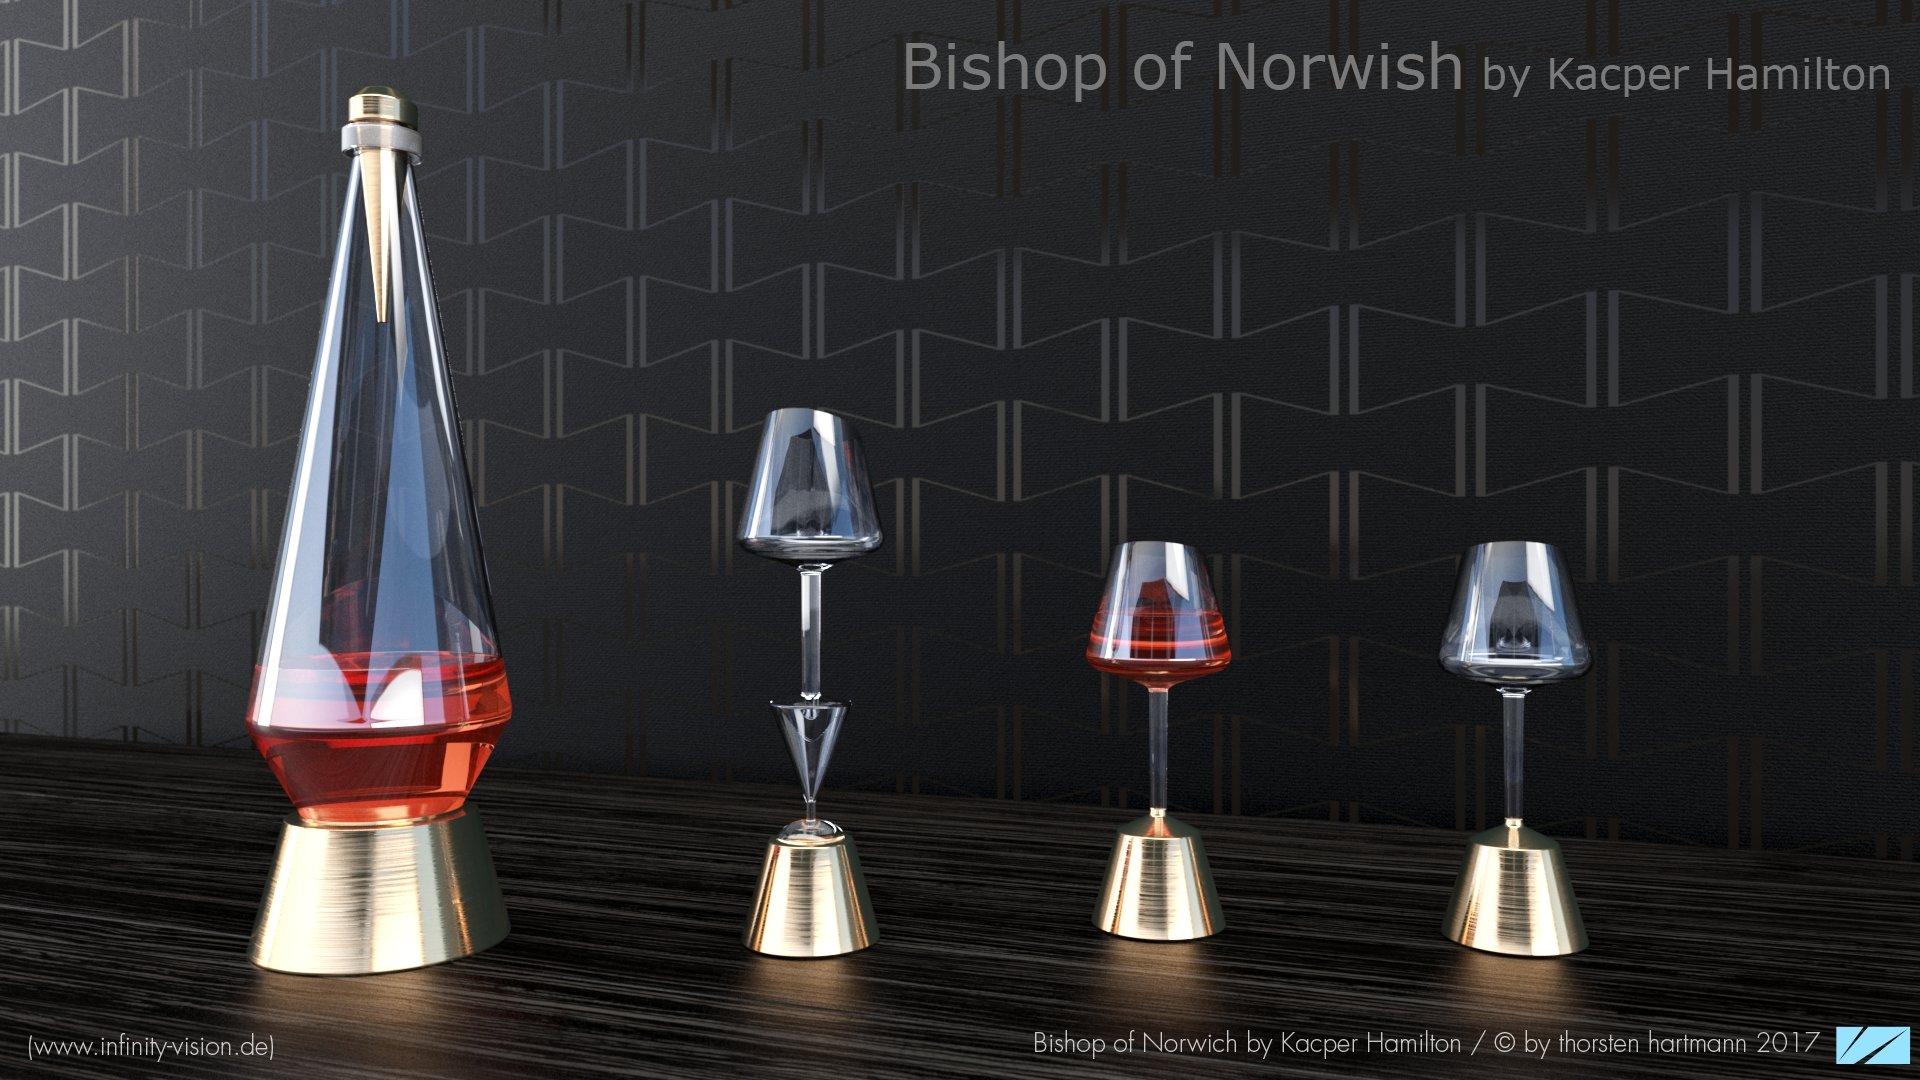 Bishop of Norwish by Kacper Hamilton